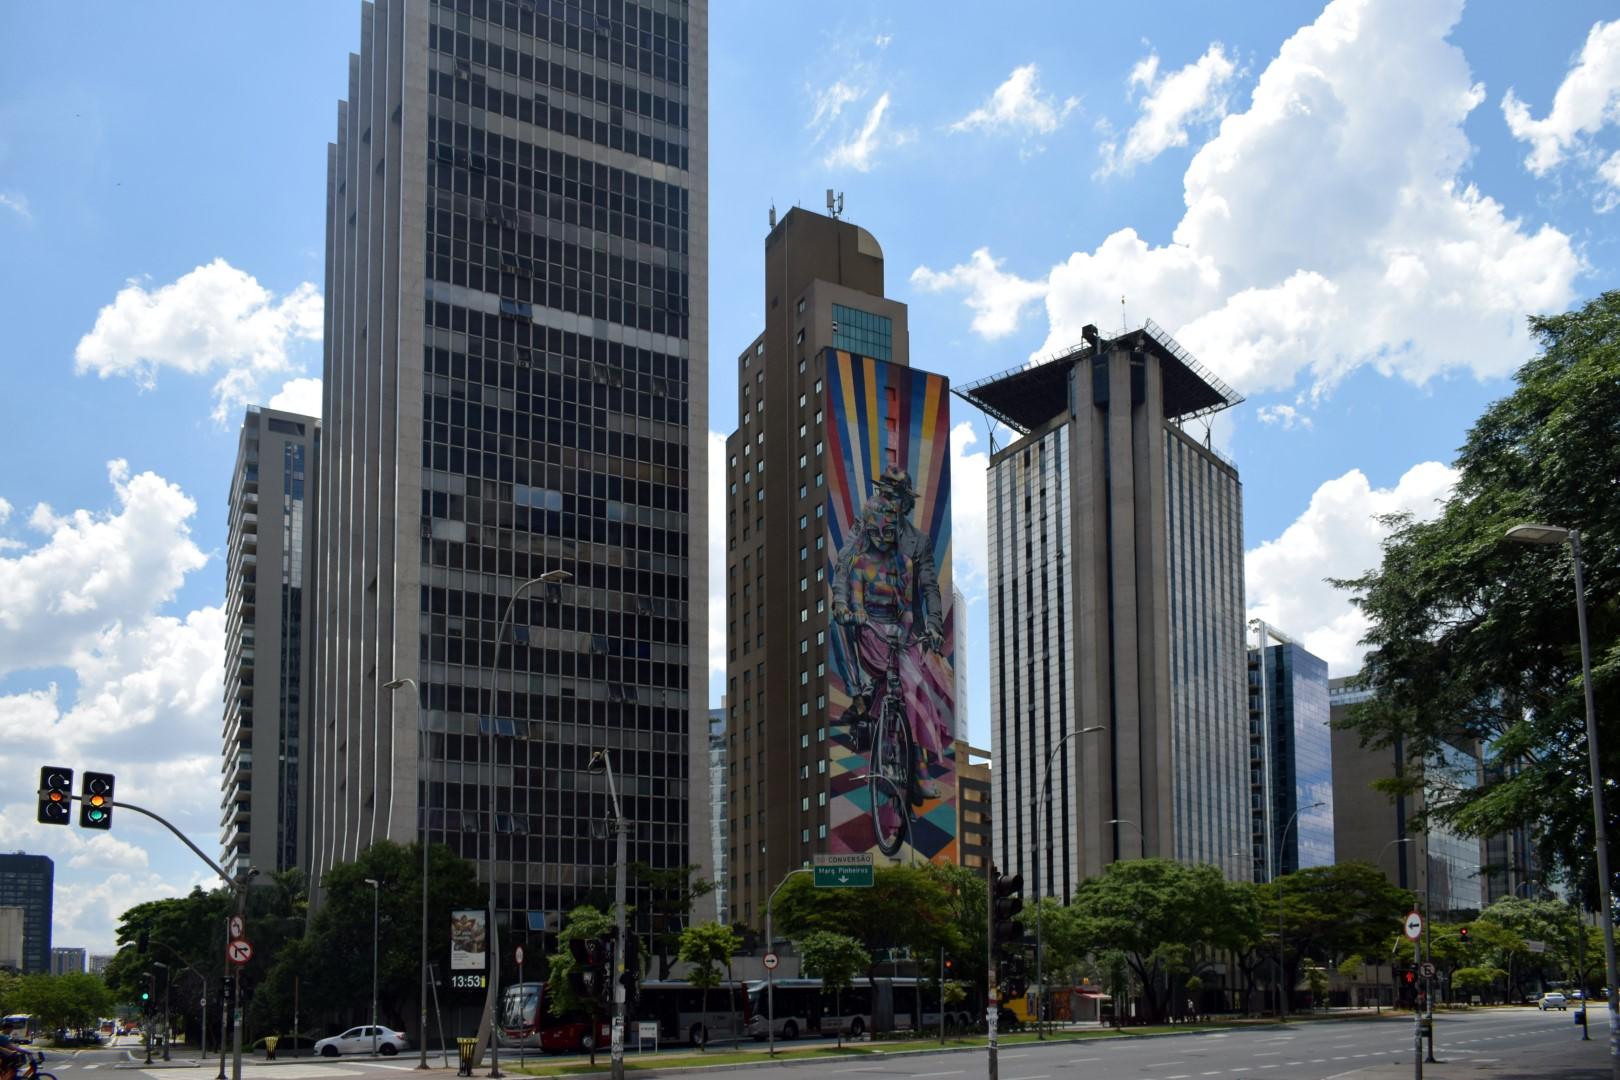 Av. Brg. Faria Lima, São Paulo